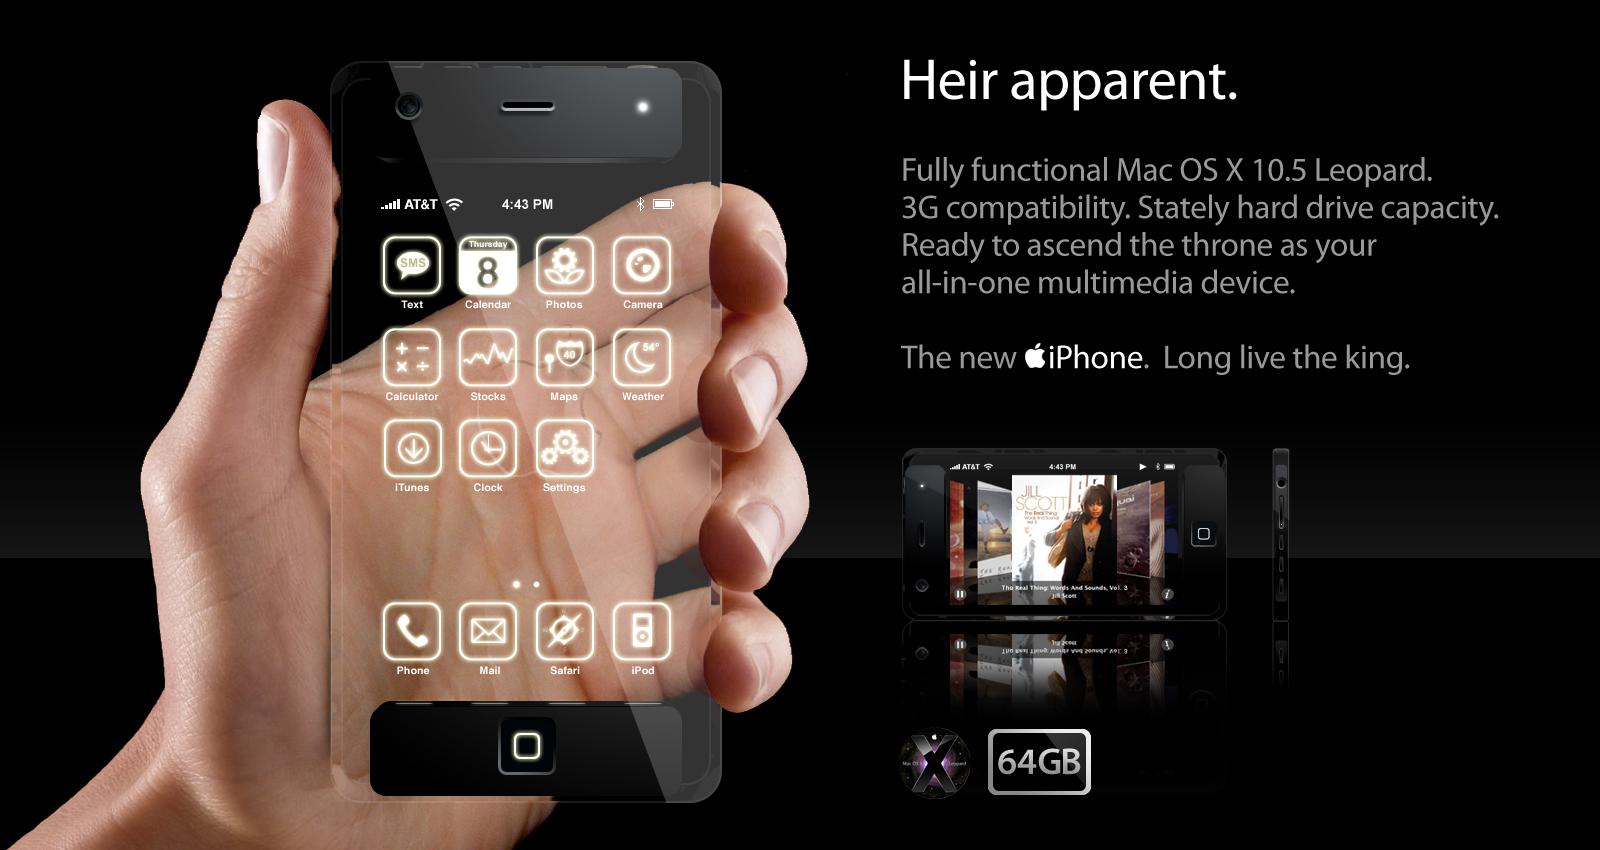 iphone22.jpg